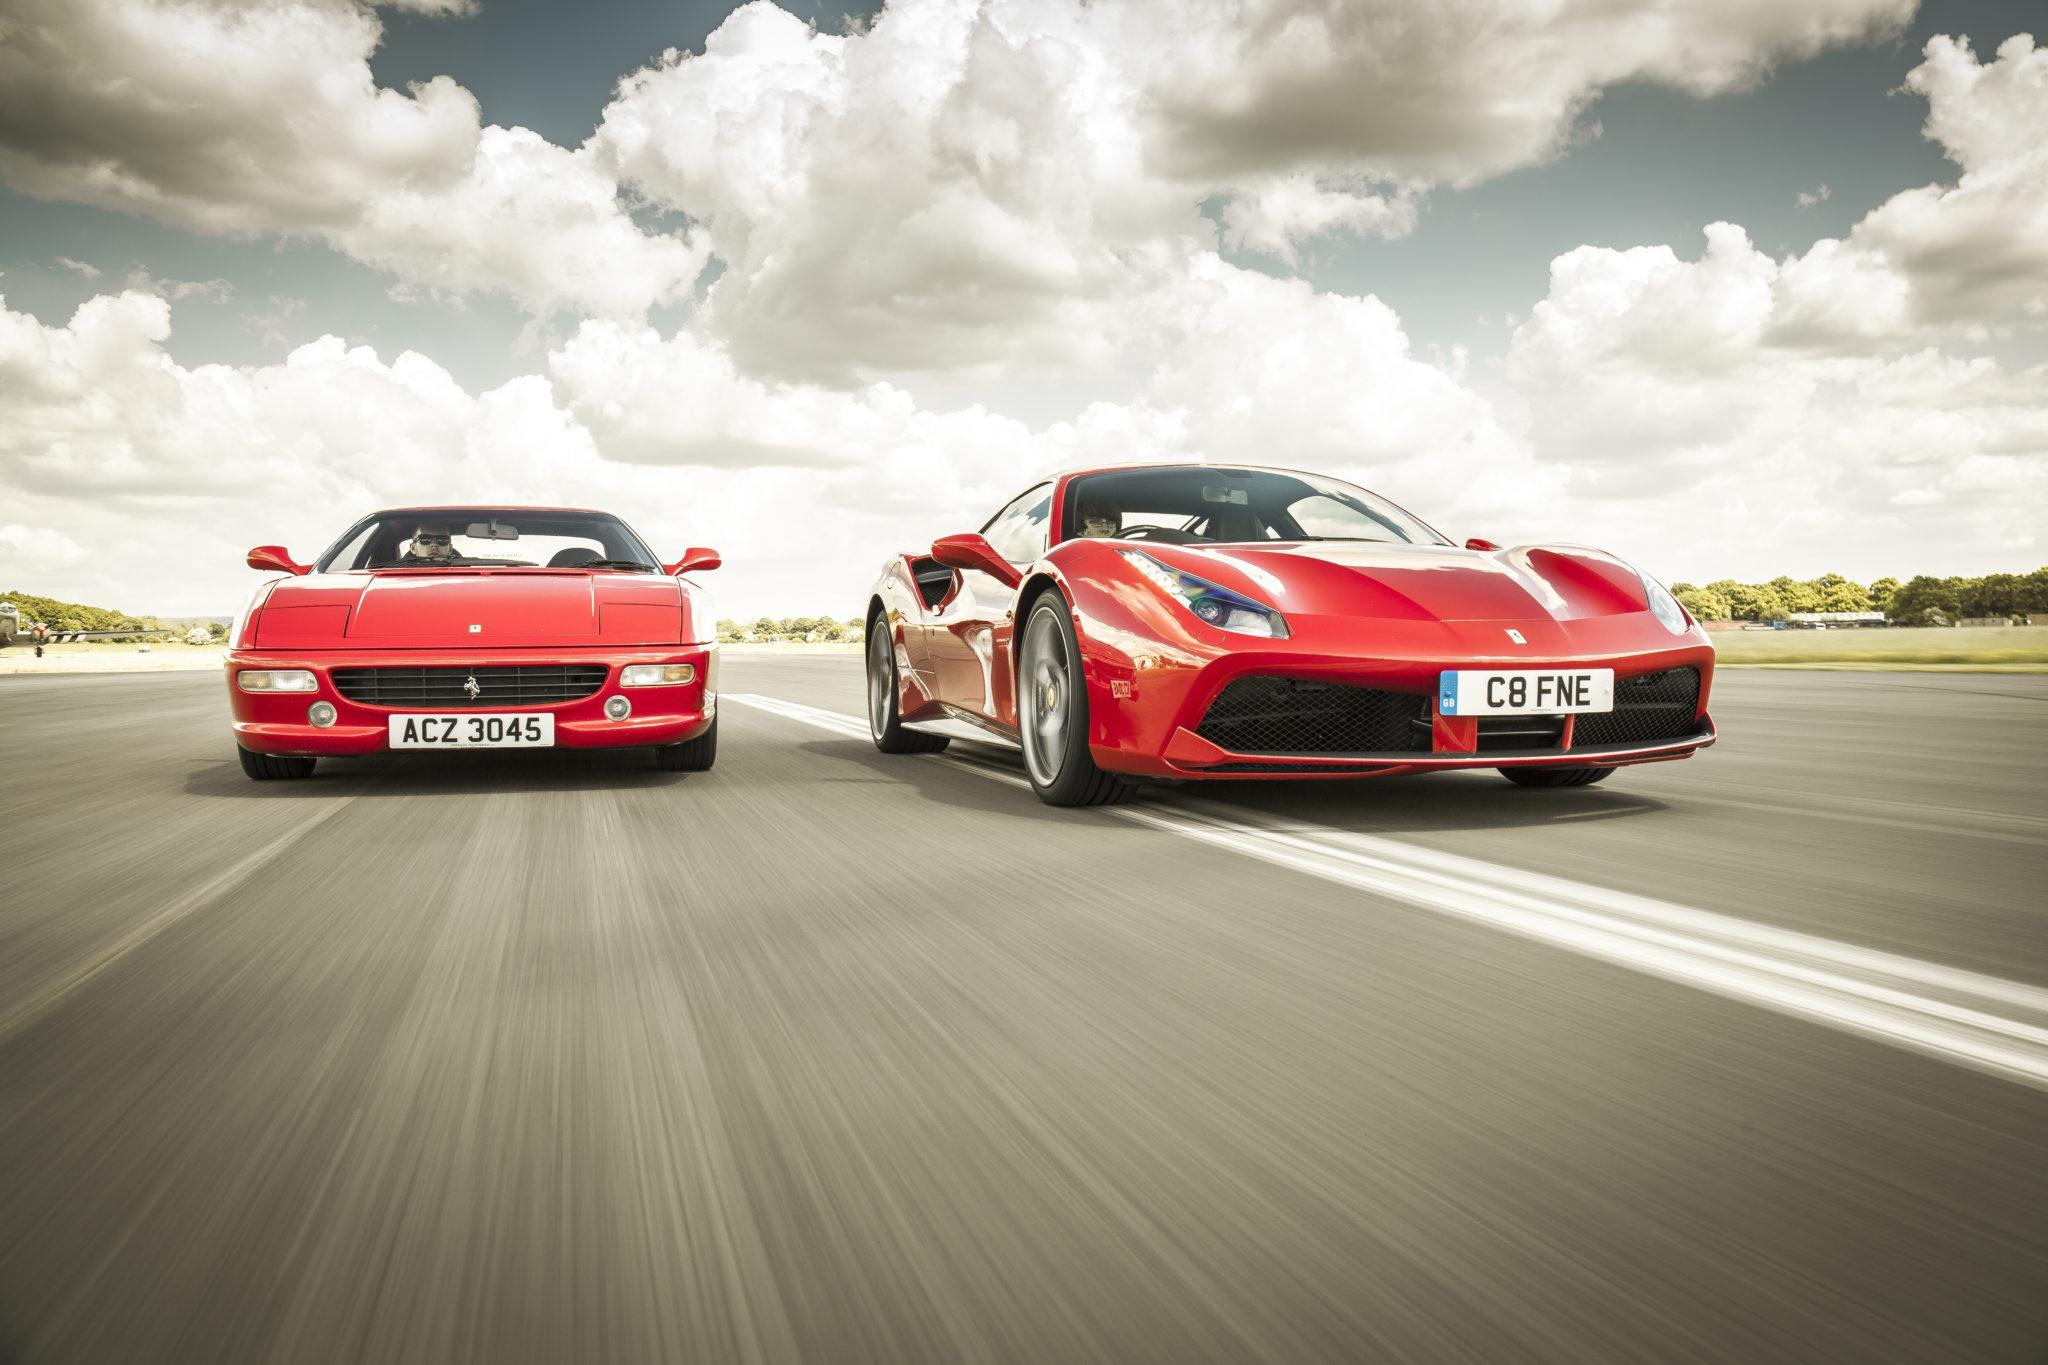 snelste Ferrari's op Fiorano f12 tdf